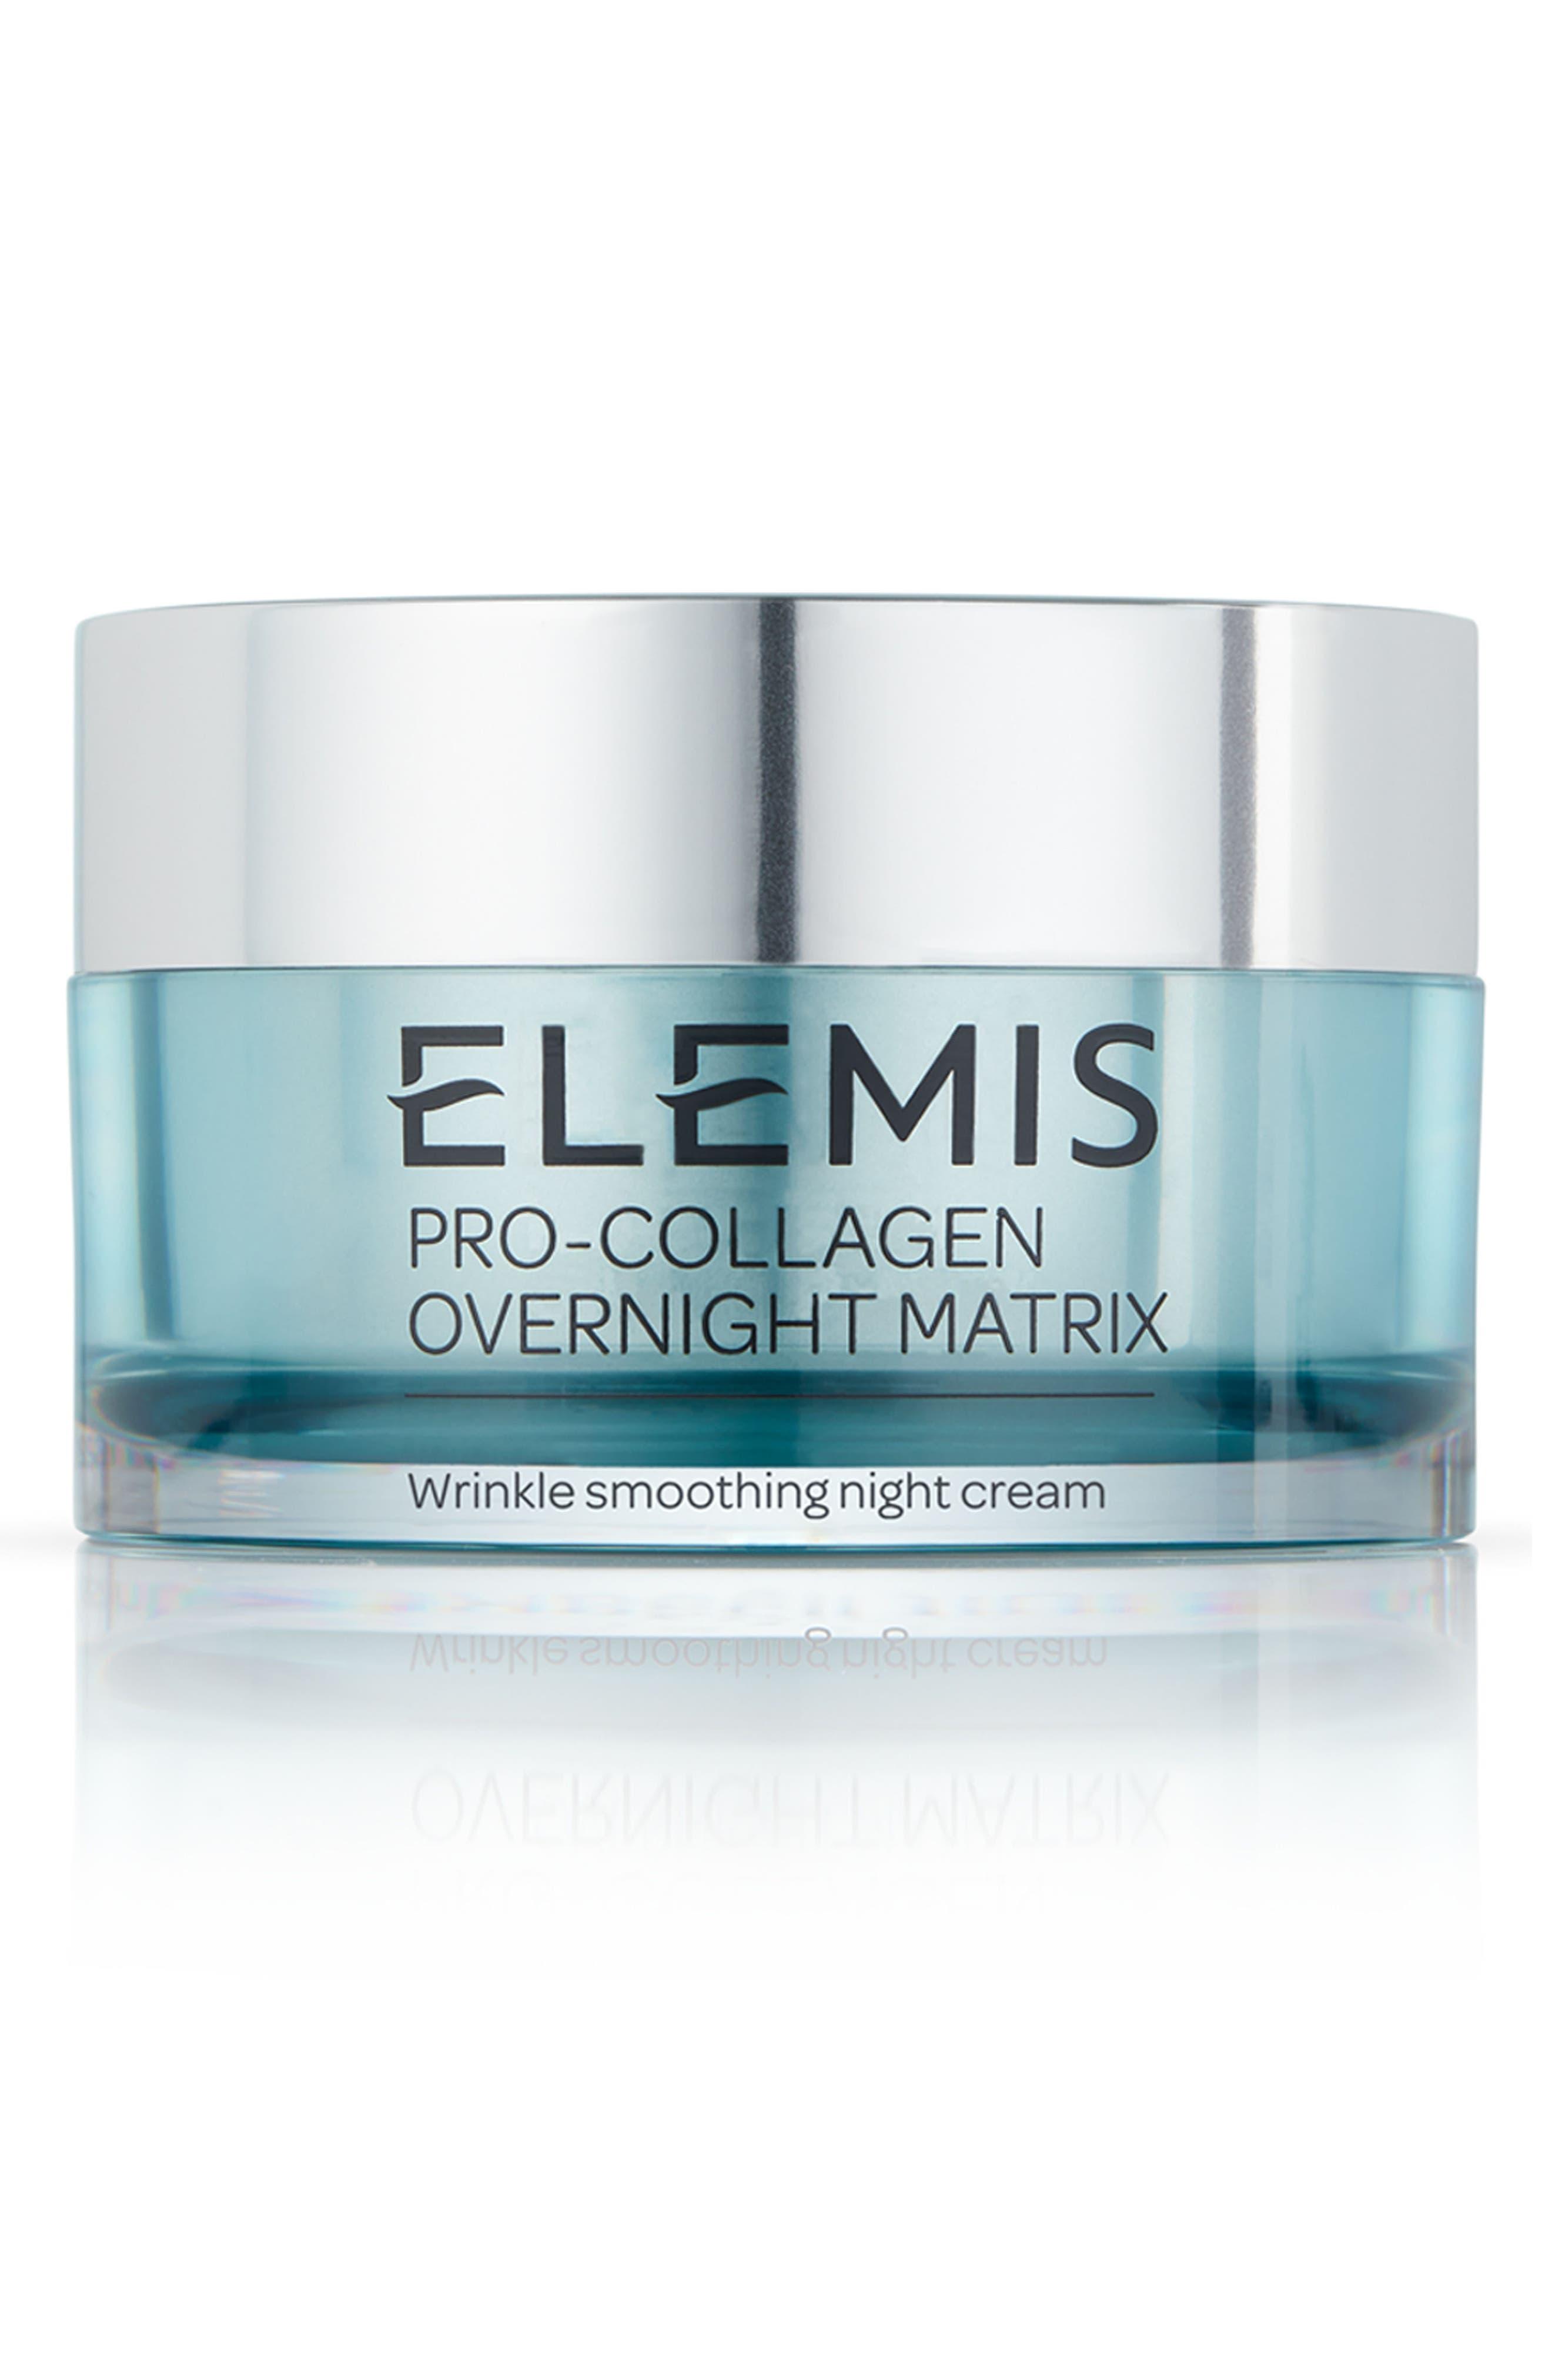 Pro-Collagen Overnight Matrix, 1.0 Oz./ 30 Ml